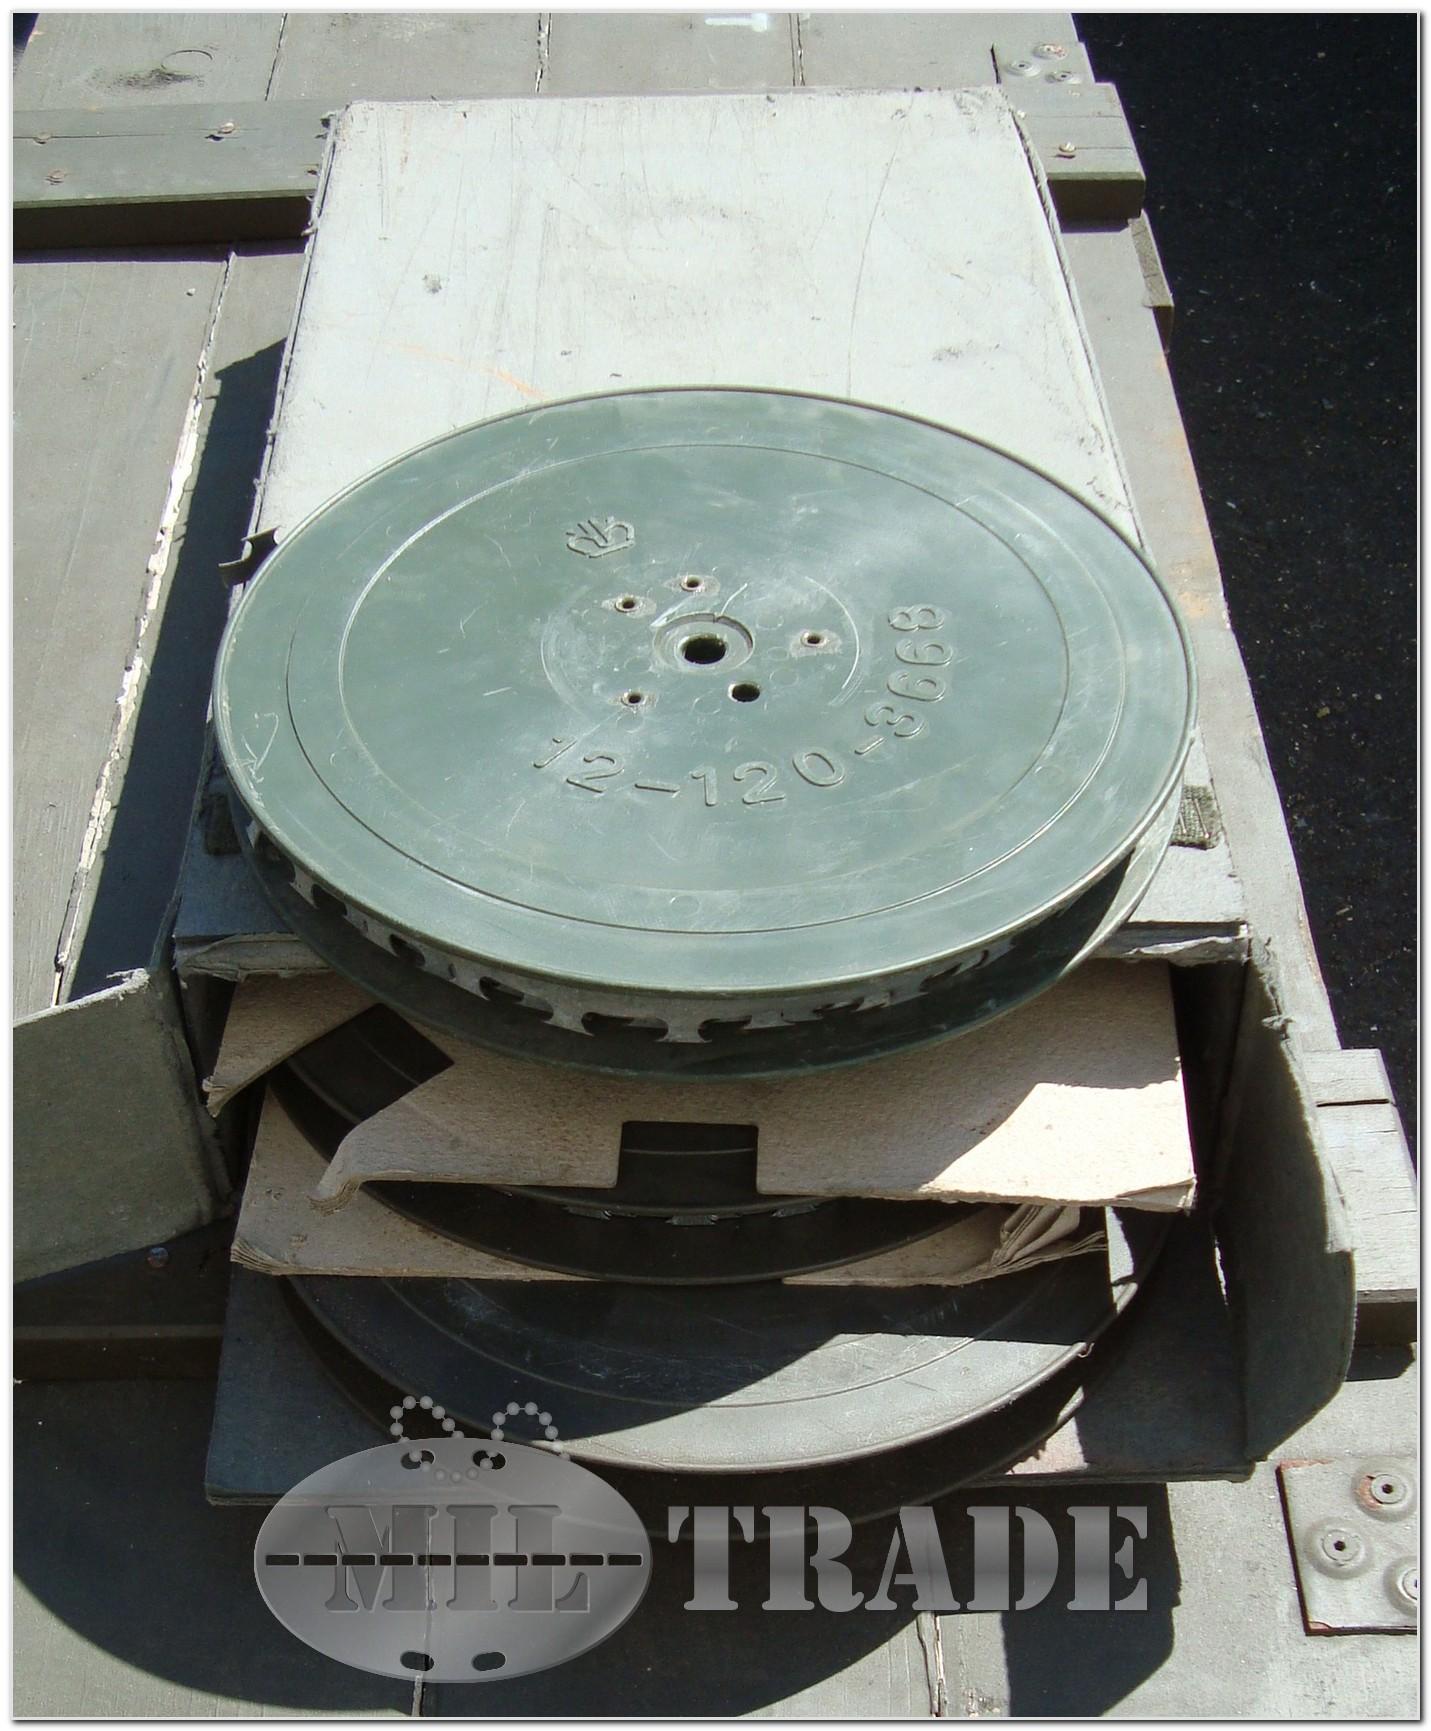 BW 6 x Rolle 50m Bandstacheldraht Nato Stacheldraht Verlegevorrichtung TOP